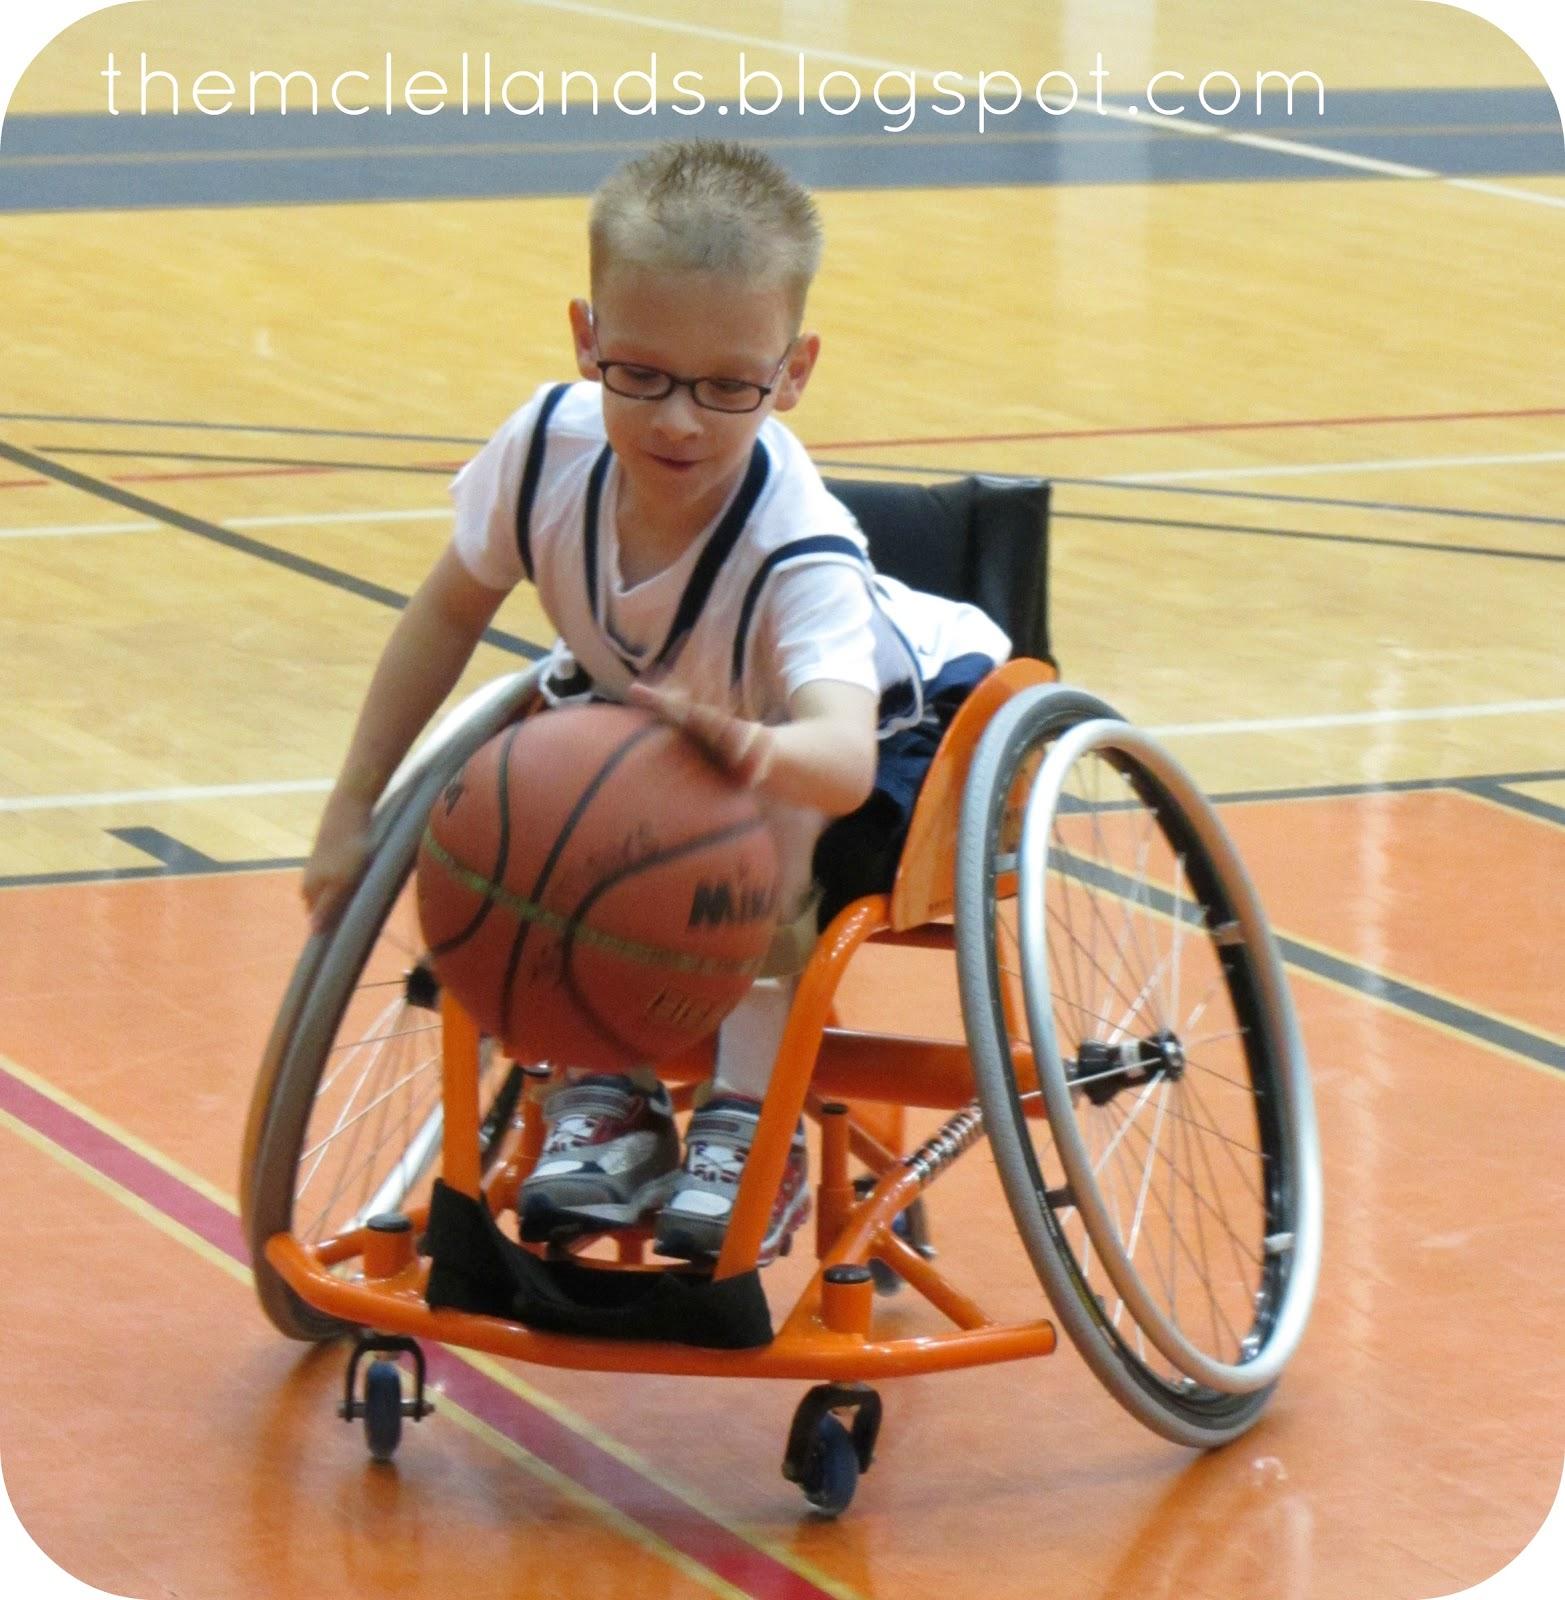 Uno Wheelchair College Tournament: Beyond Measure: Wheelchair Basketball Tournament